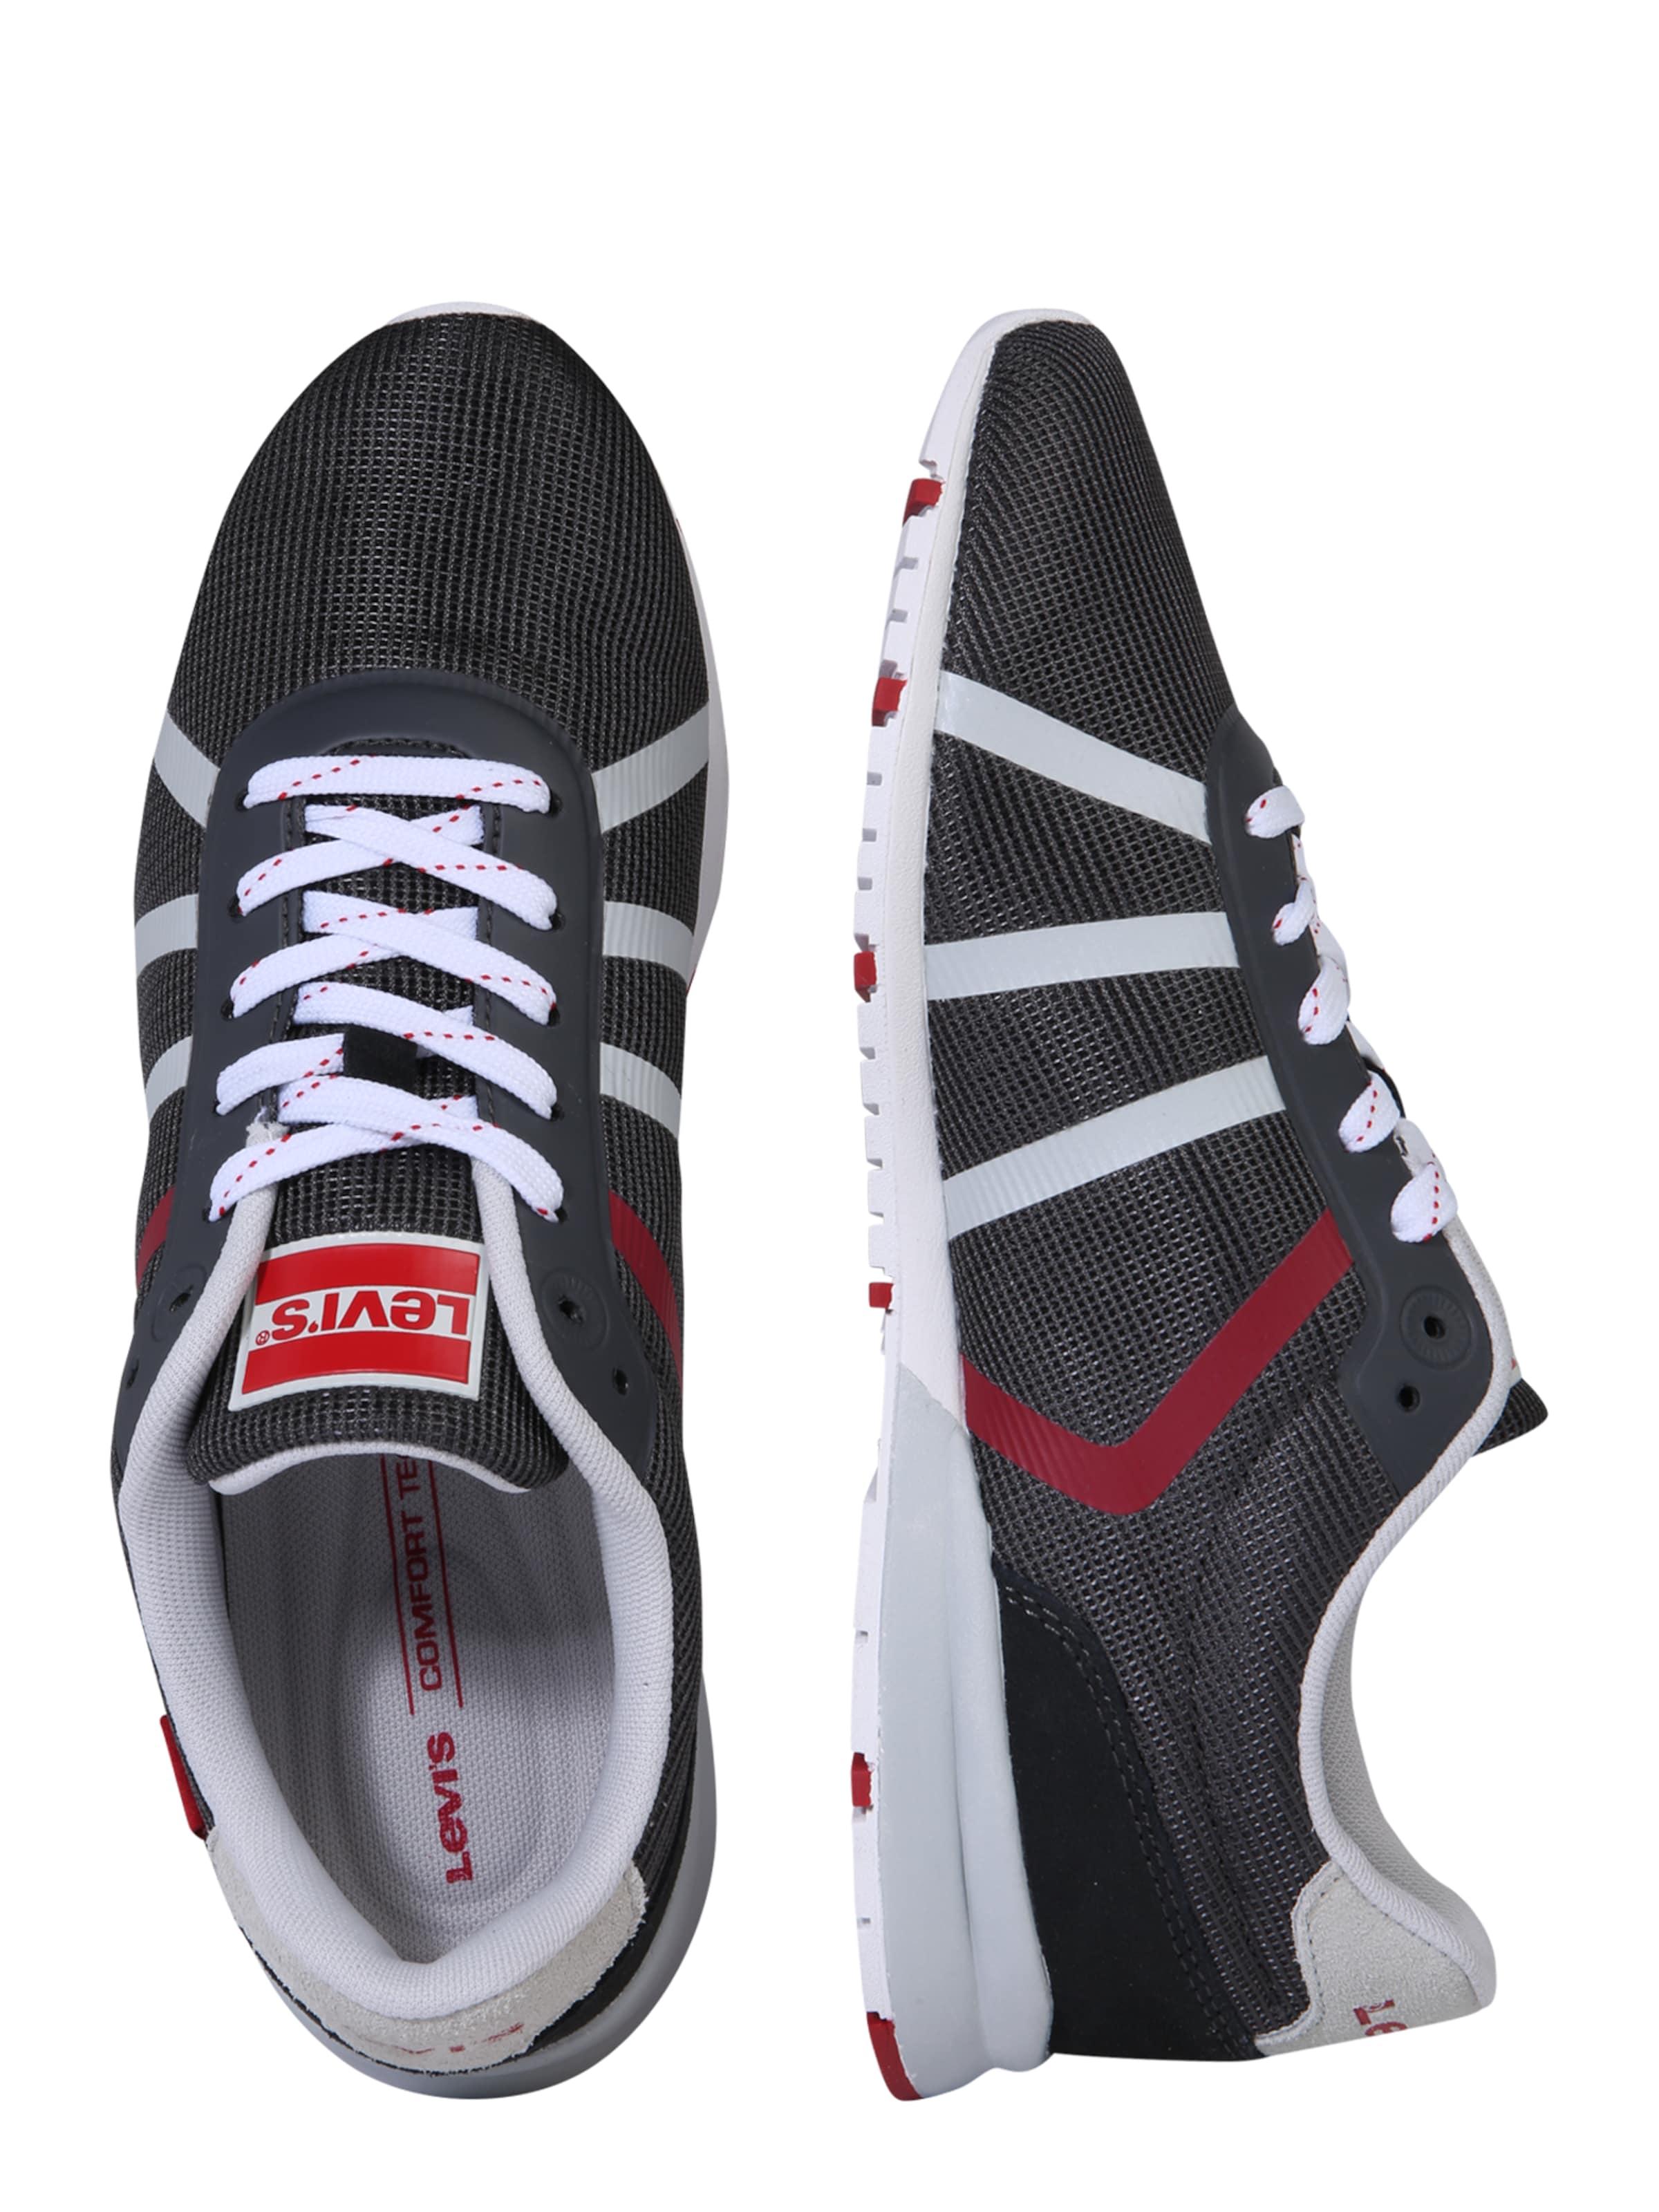 5e8e138420 Grau 'almayer Levi's Sneaker Lite' In jSVMpGLqUz